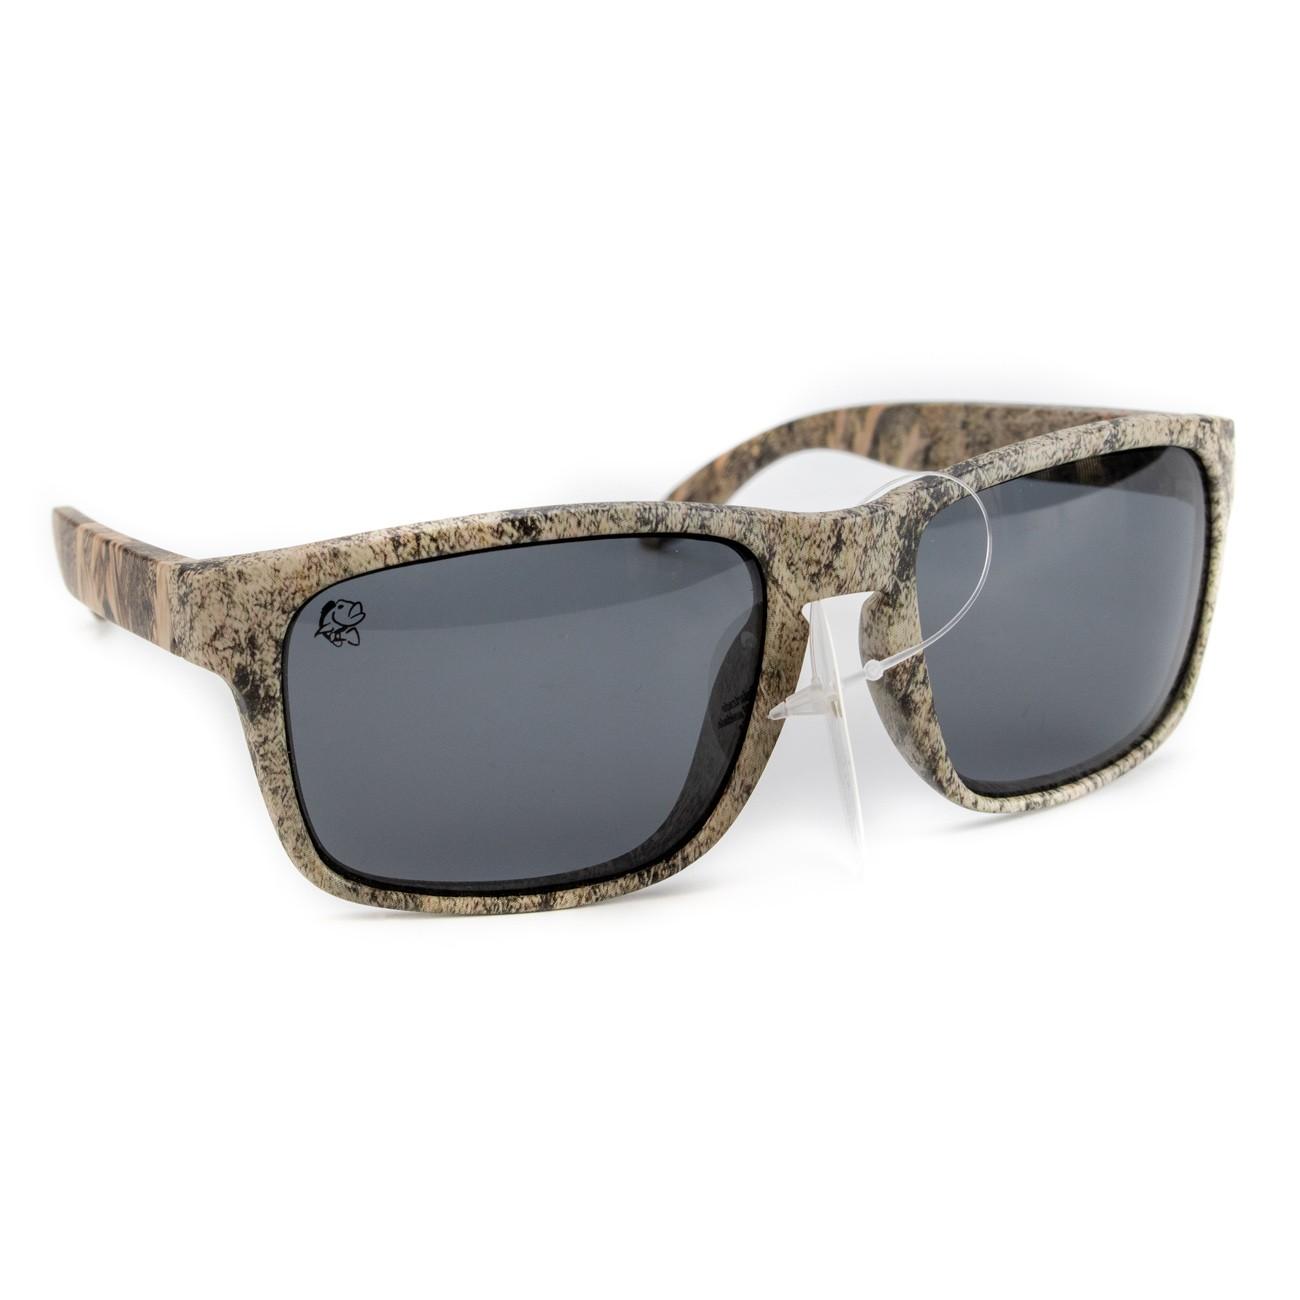 Óculos Polarizado Infinity Pro-Tsuri - Real Tree Camo 10P0042  - Comprando & Pescando